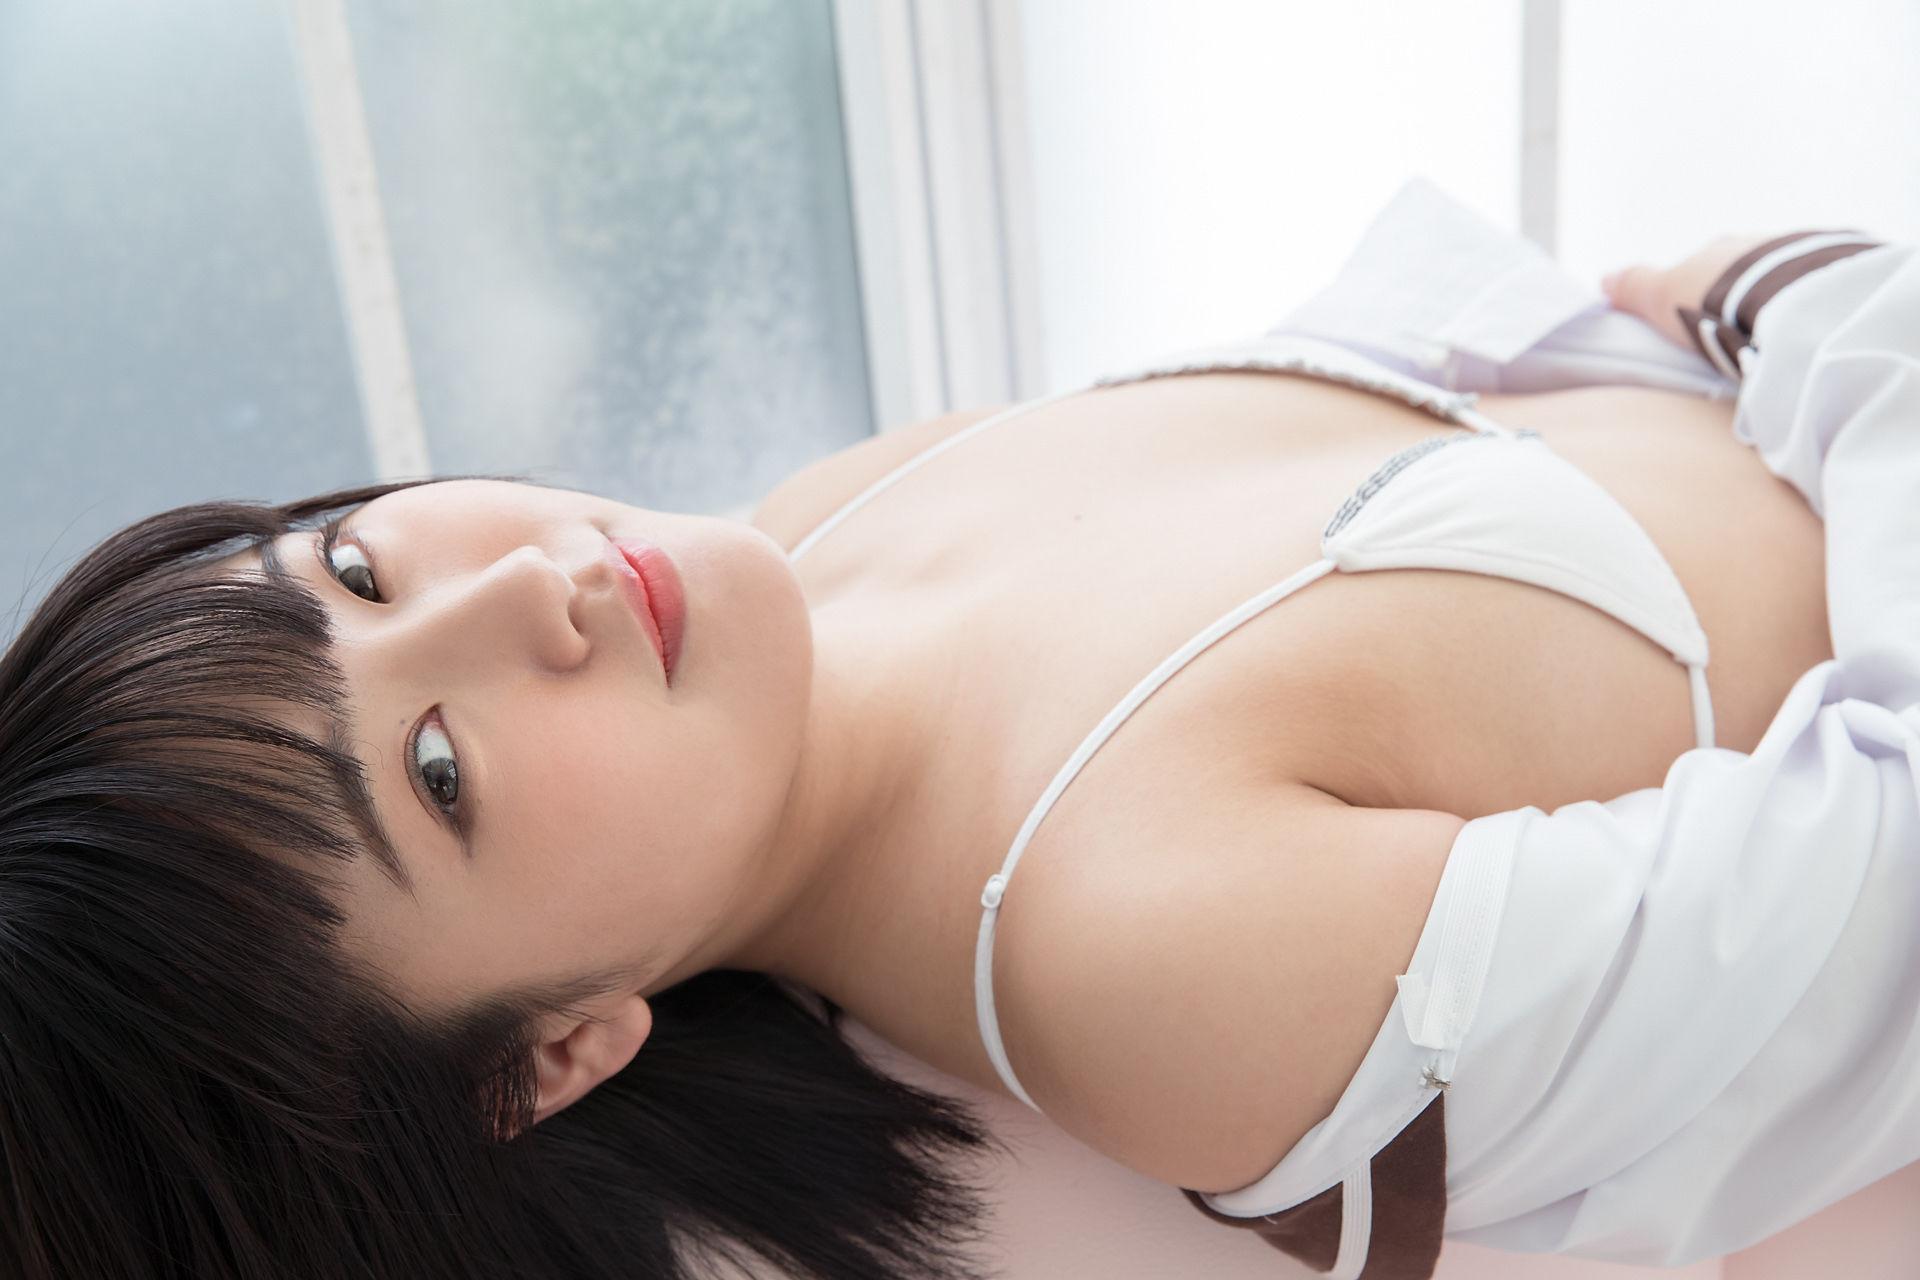 VOL.24 [Minisuka.tv]性感少女:香月杏珠(香月りお)超高清写真套图(35P)